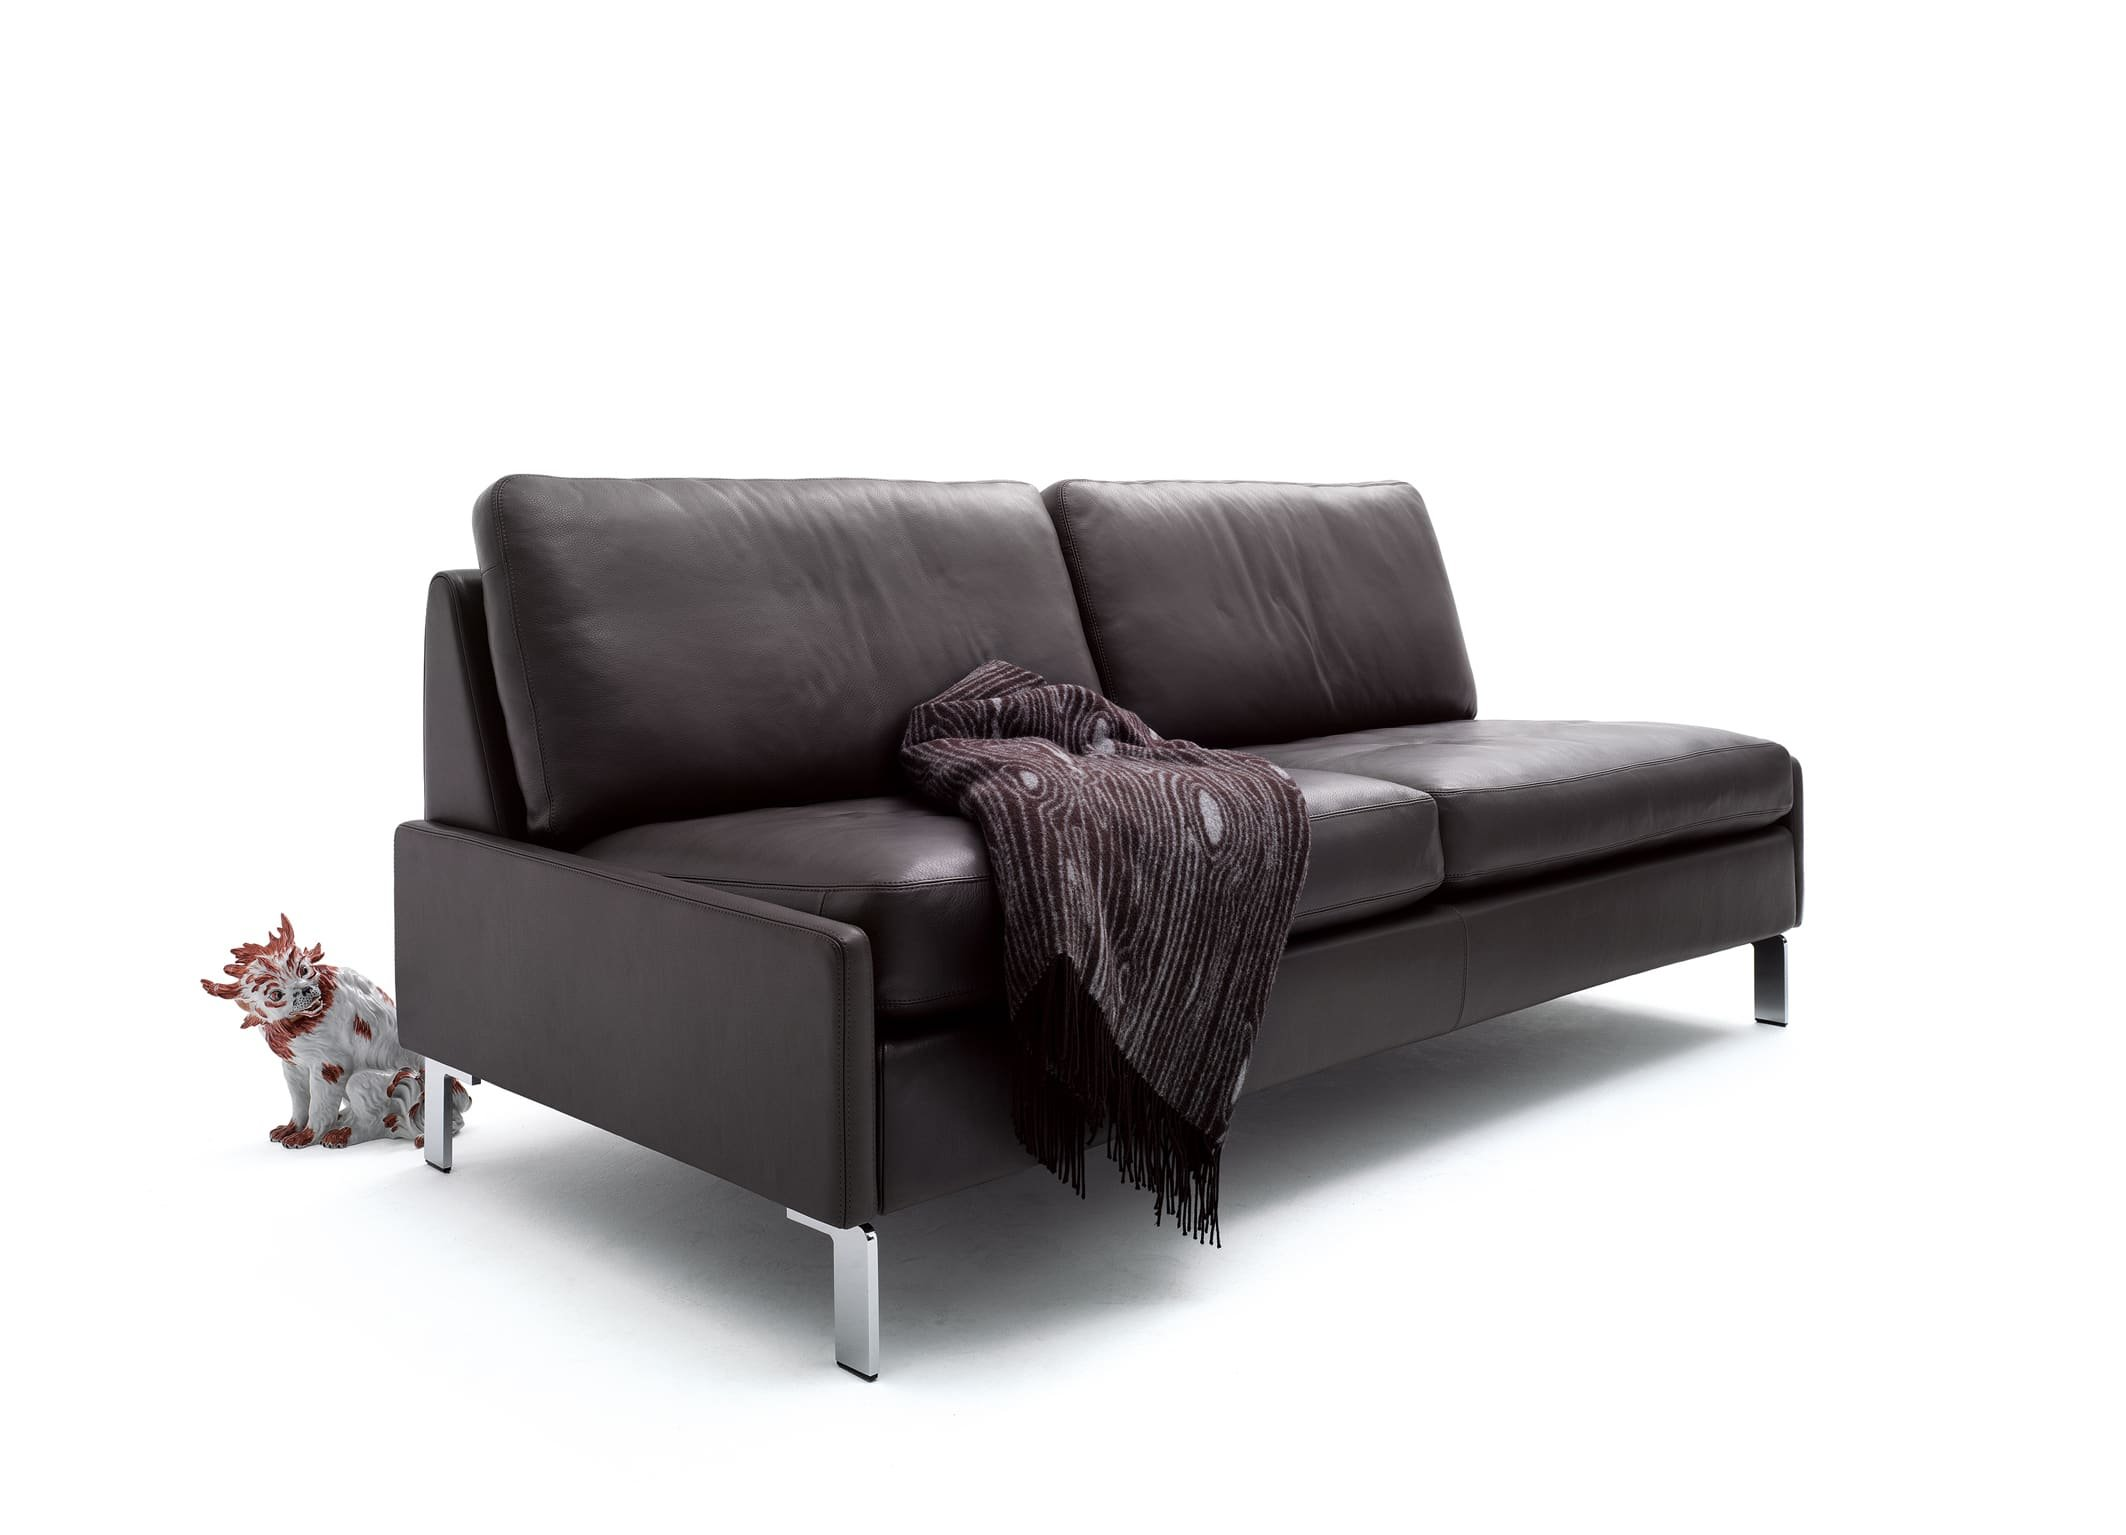 the new models in 2014 cor. Black Bedroom Furniture Sets. Home Design Ideas